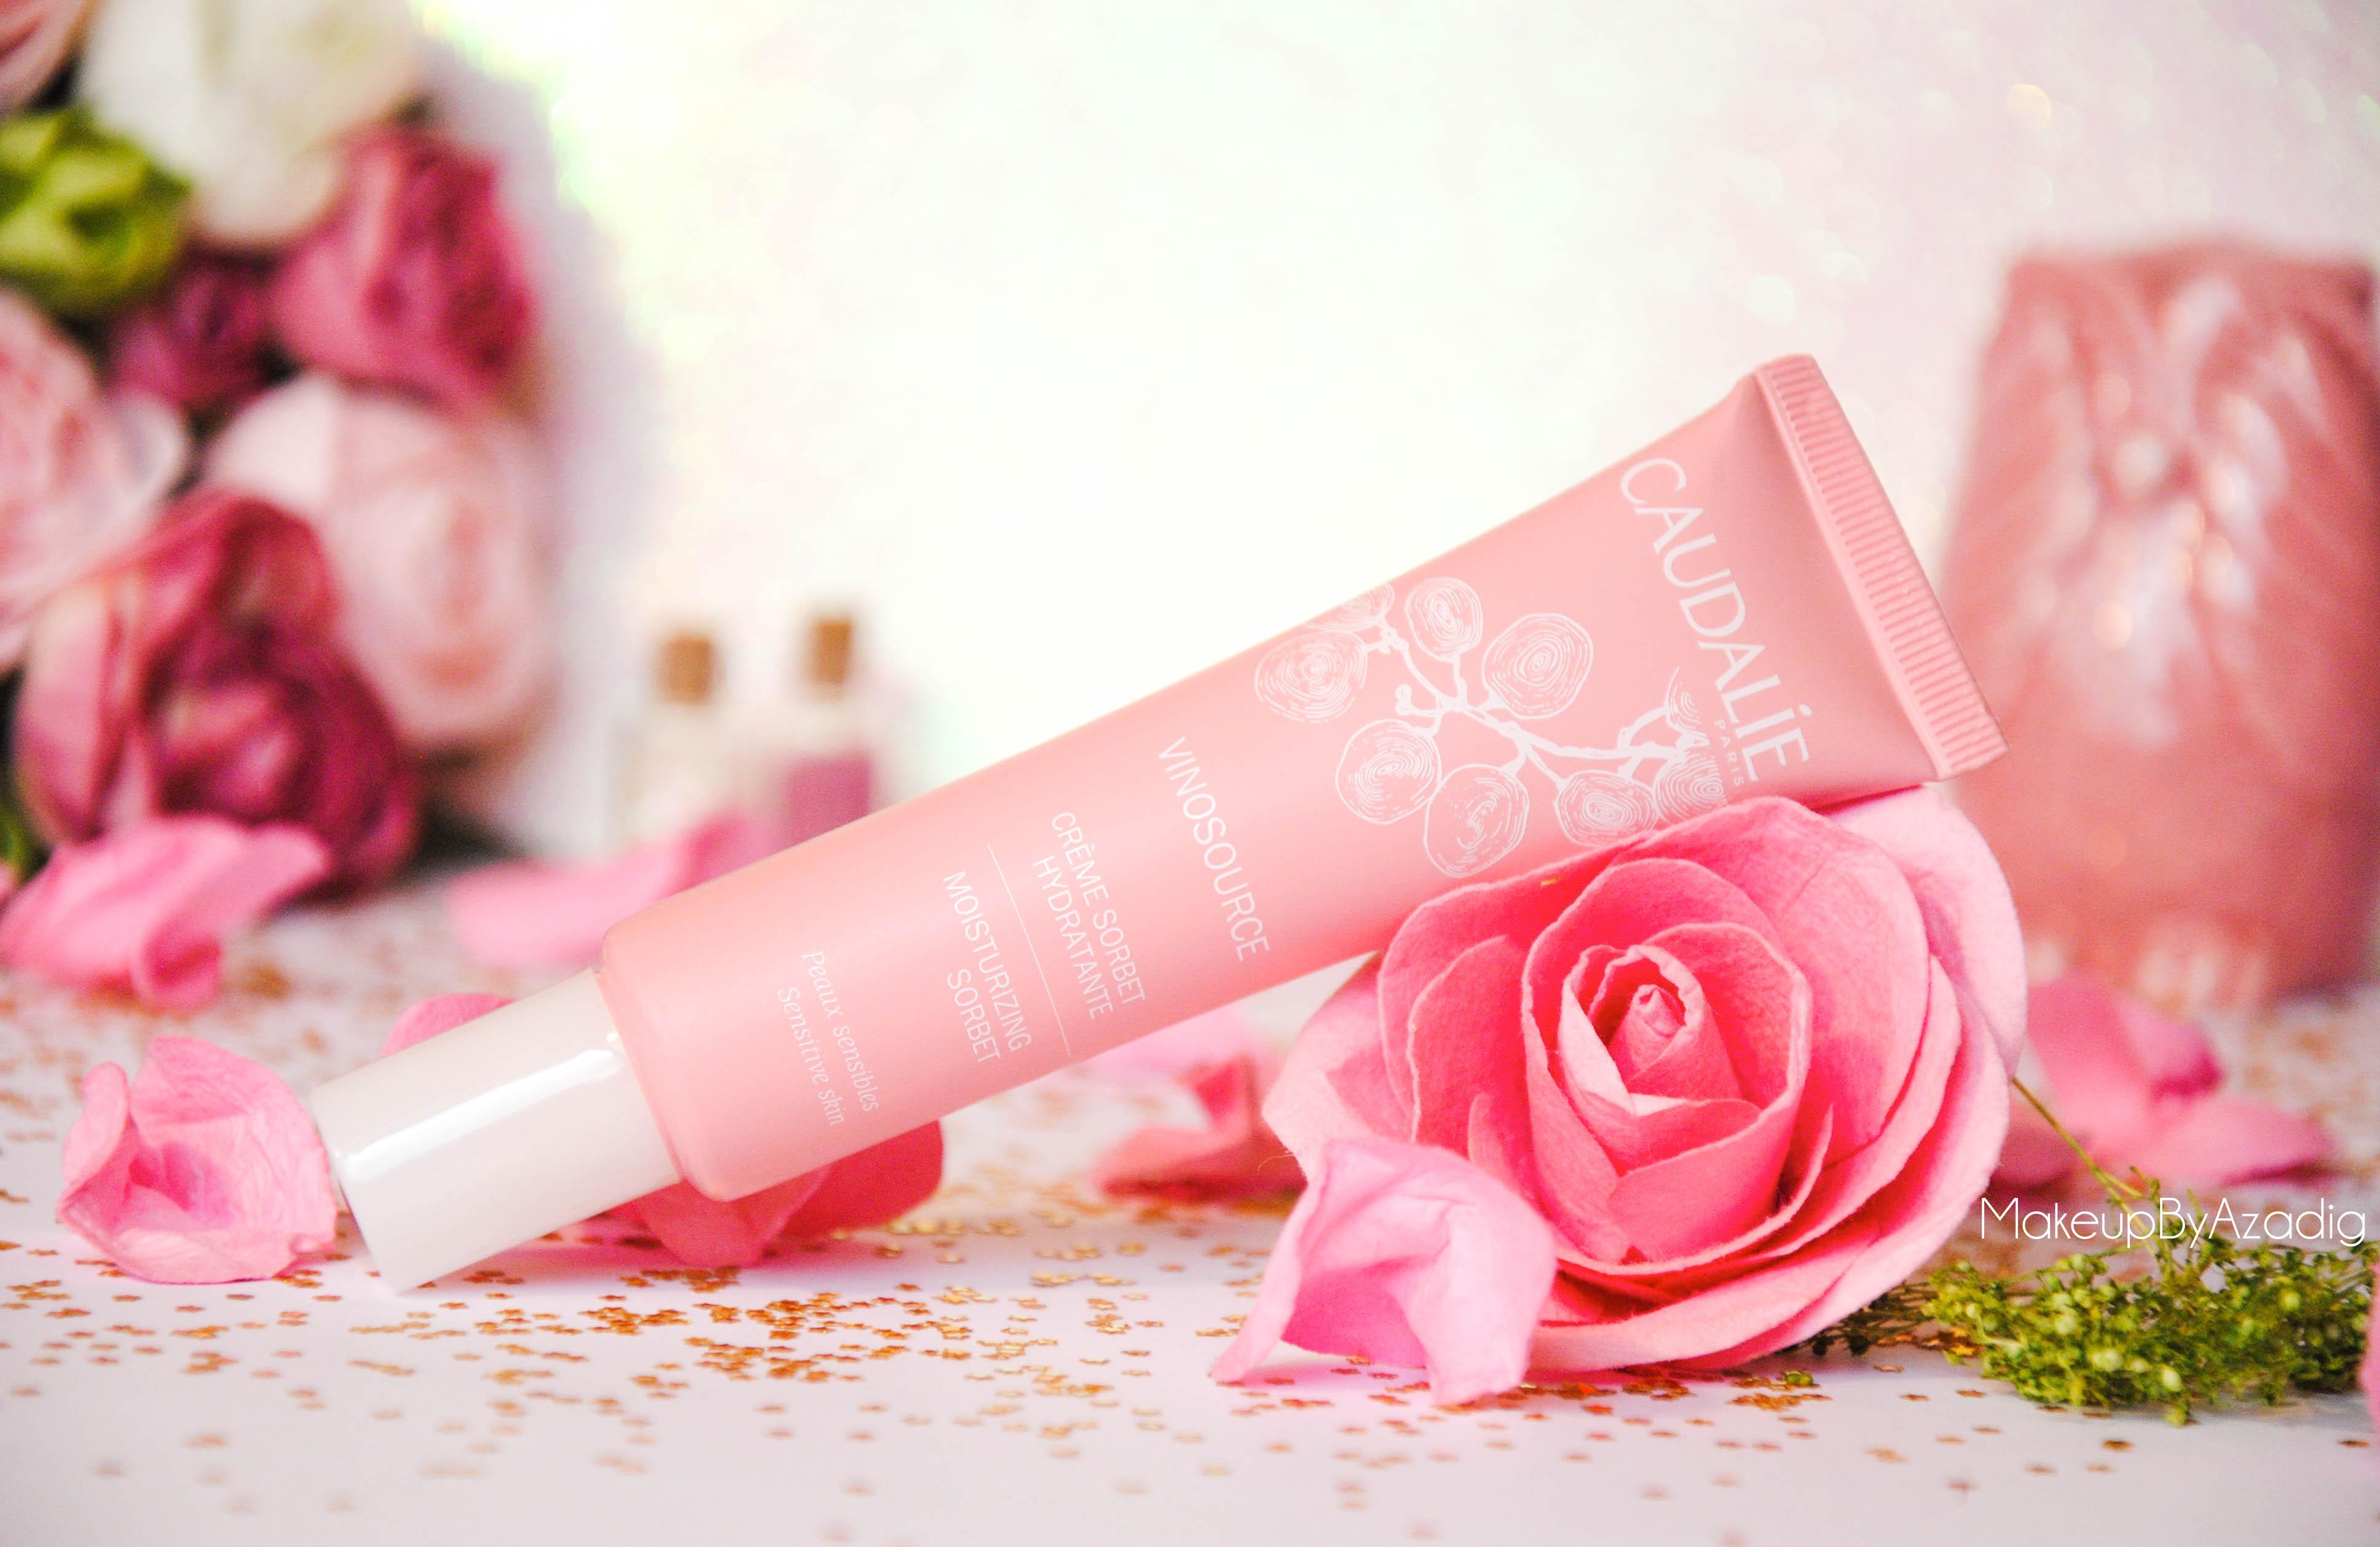 creme hydratante vinosource caudalie avis revue doctipharma makeupbyazadig pink